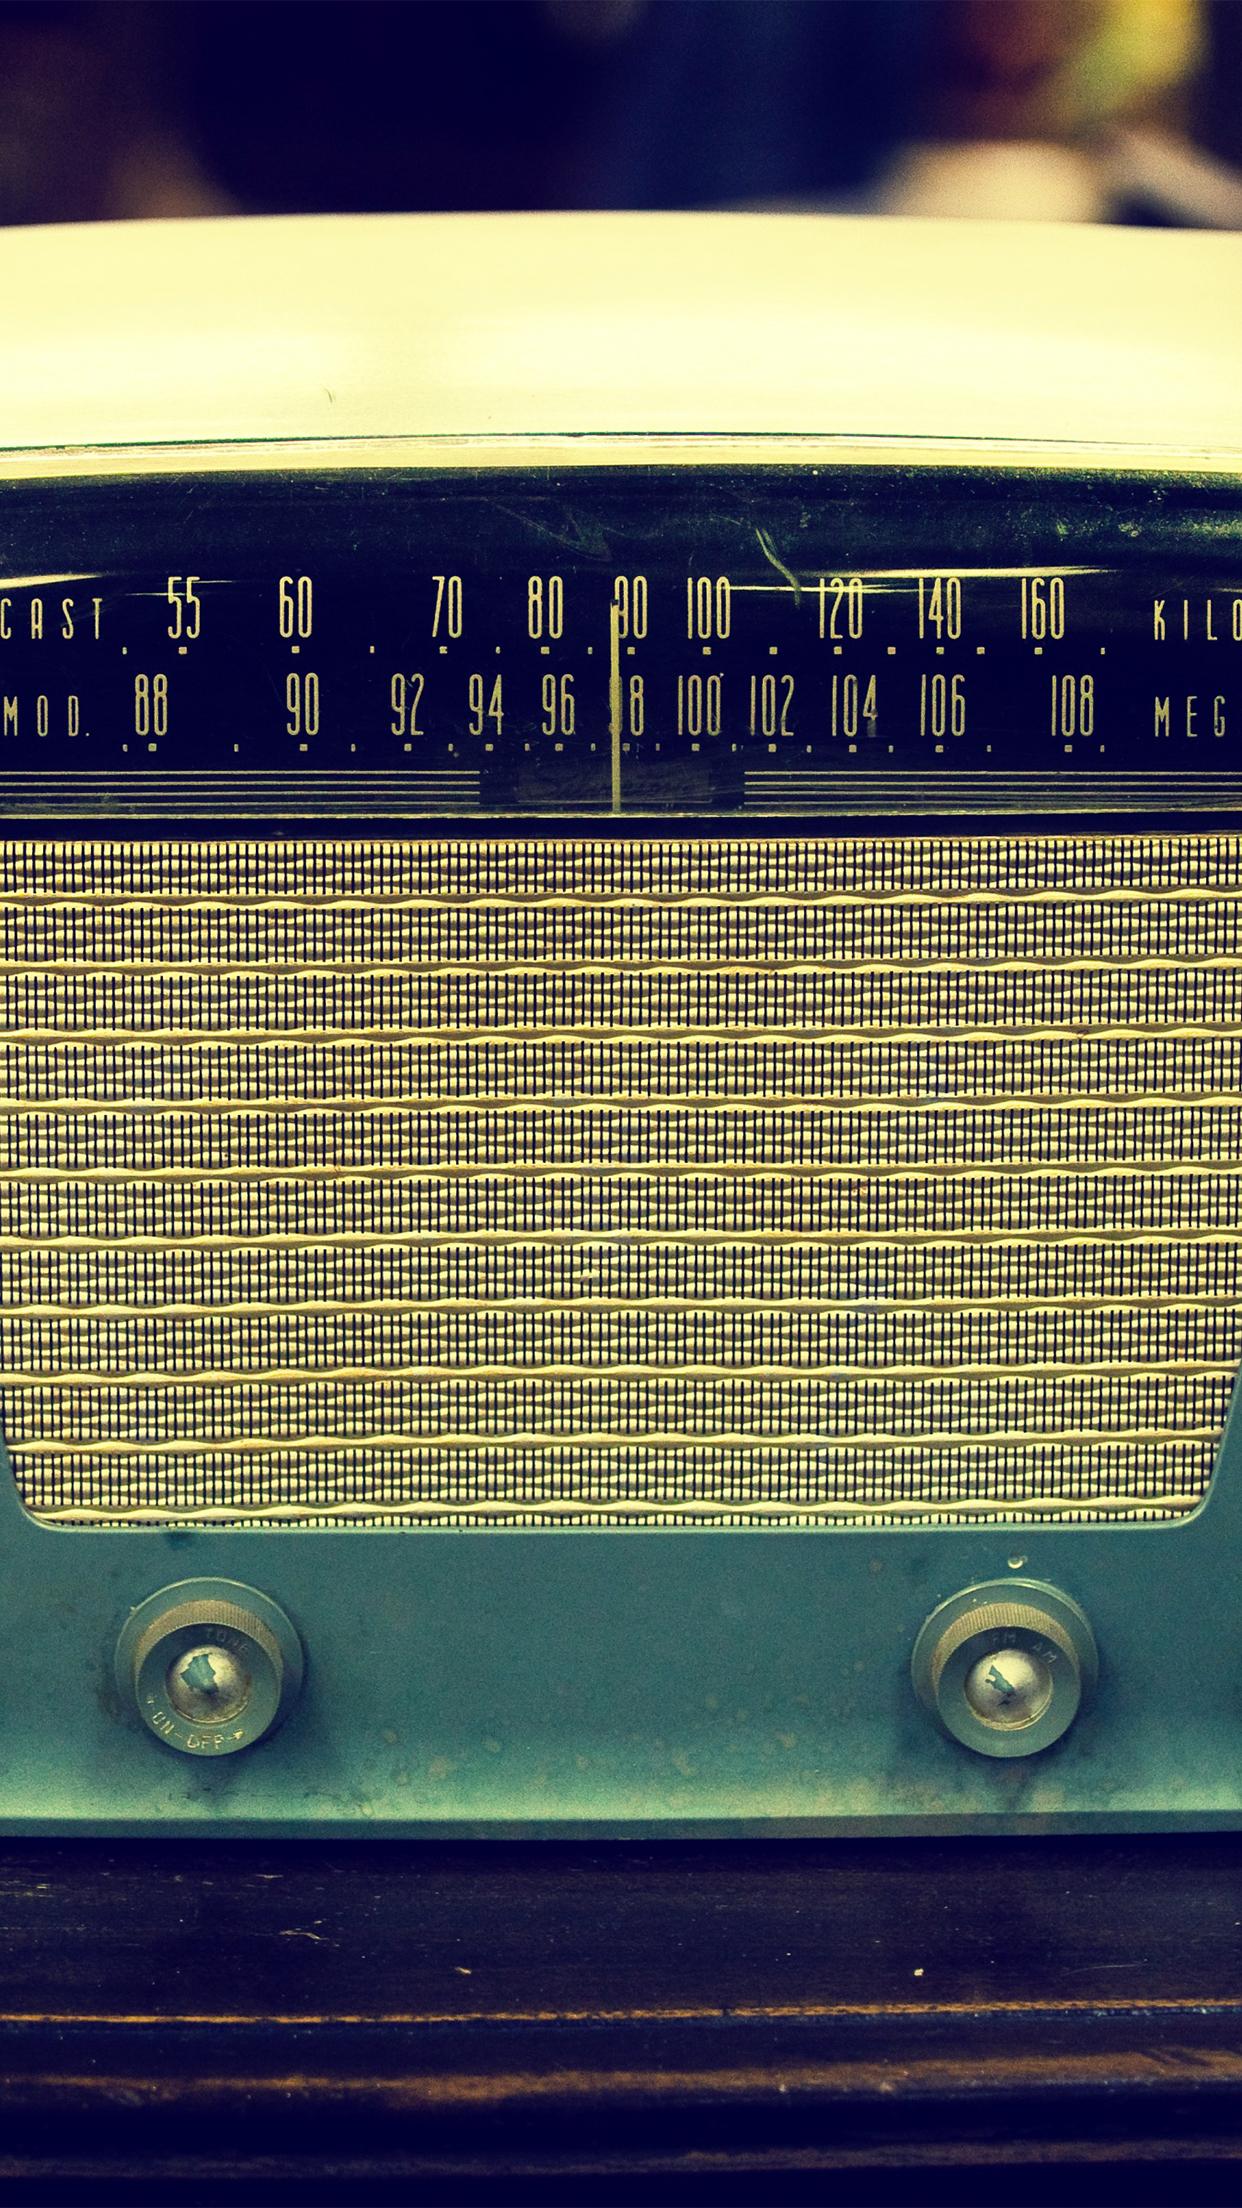 vintage car radio wallpaper - photo #21